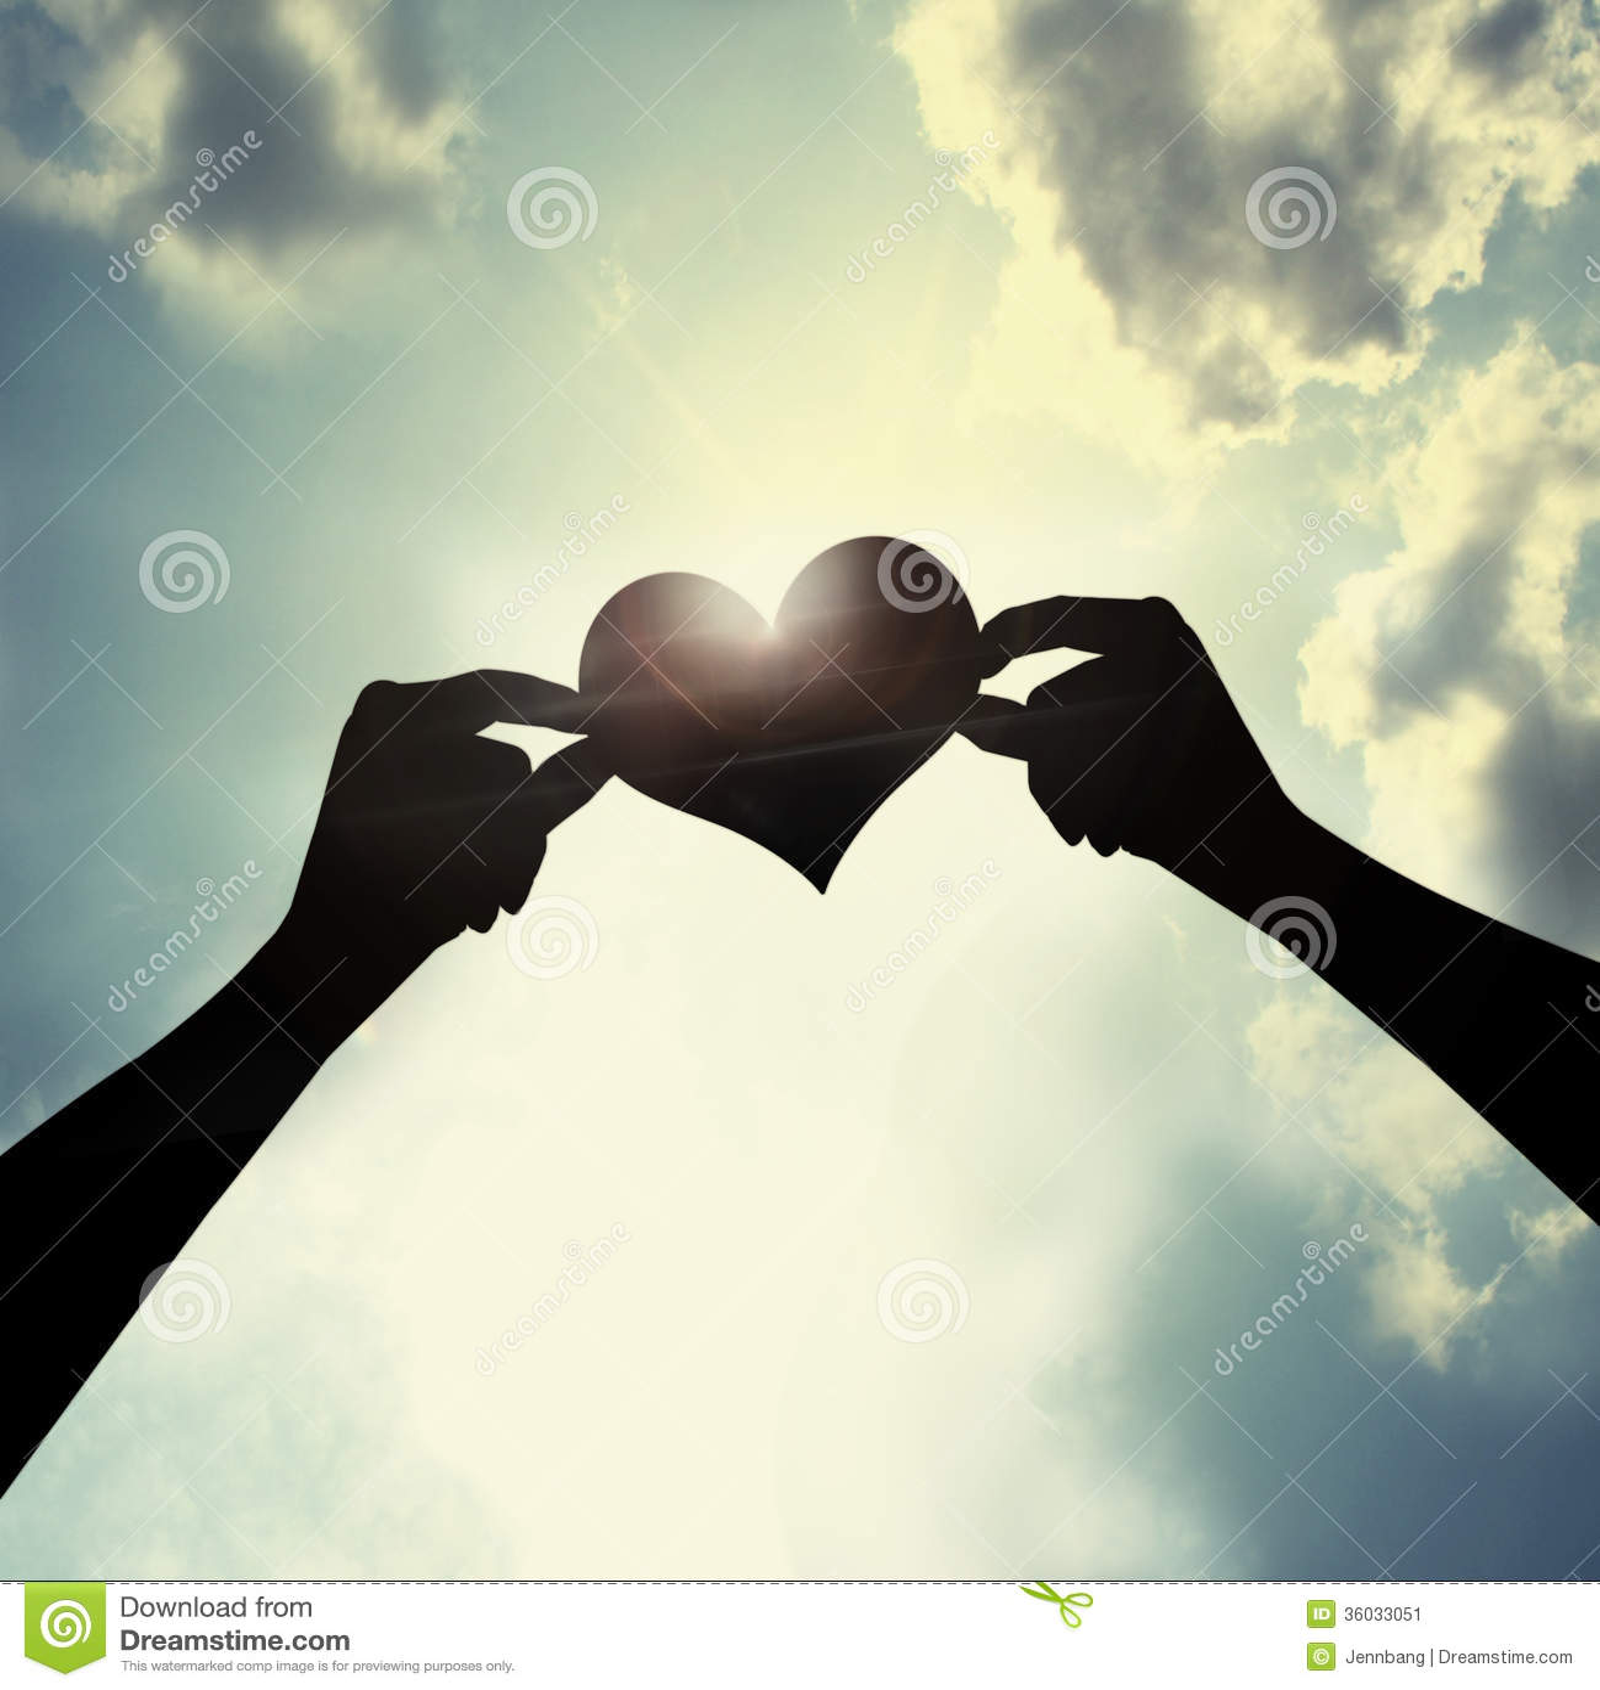 forever love stock image image 36033051 heart shape vector silhouette heart shape vector free black and white